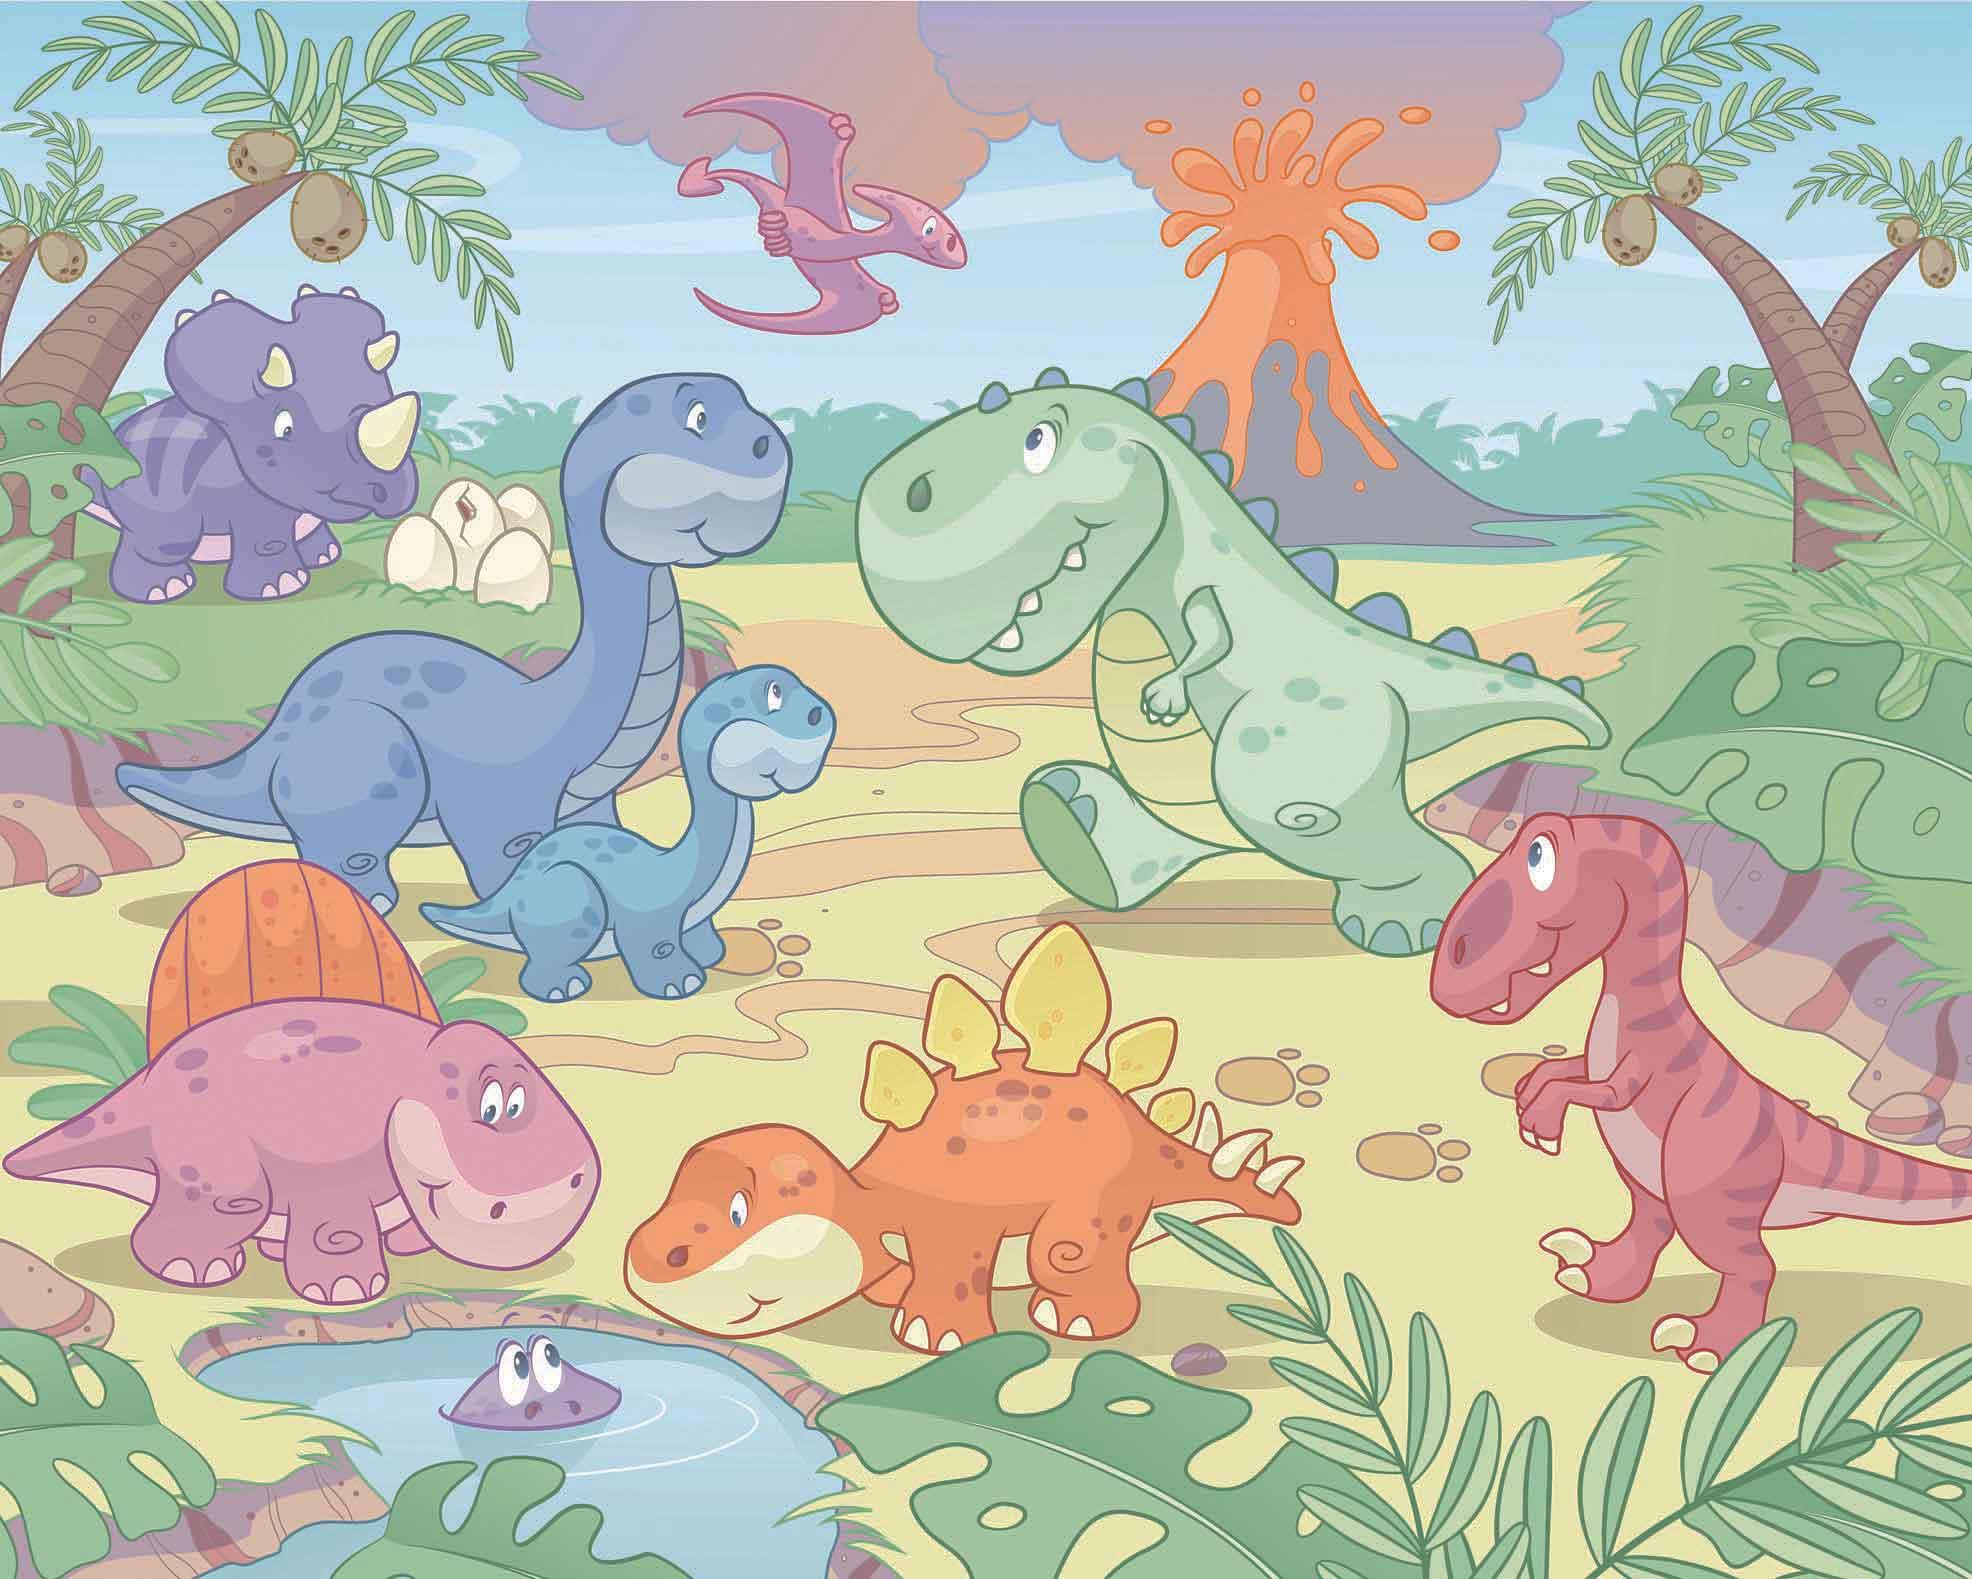 Walltastic Fototapete Riesen Wandbild Baby Dinosaurier Dino World